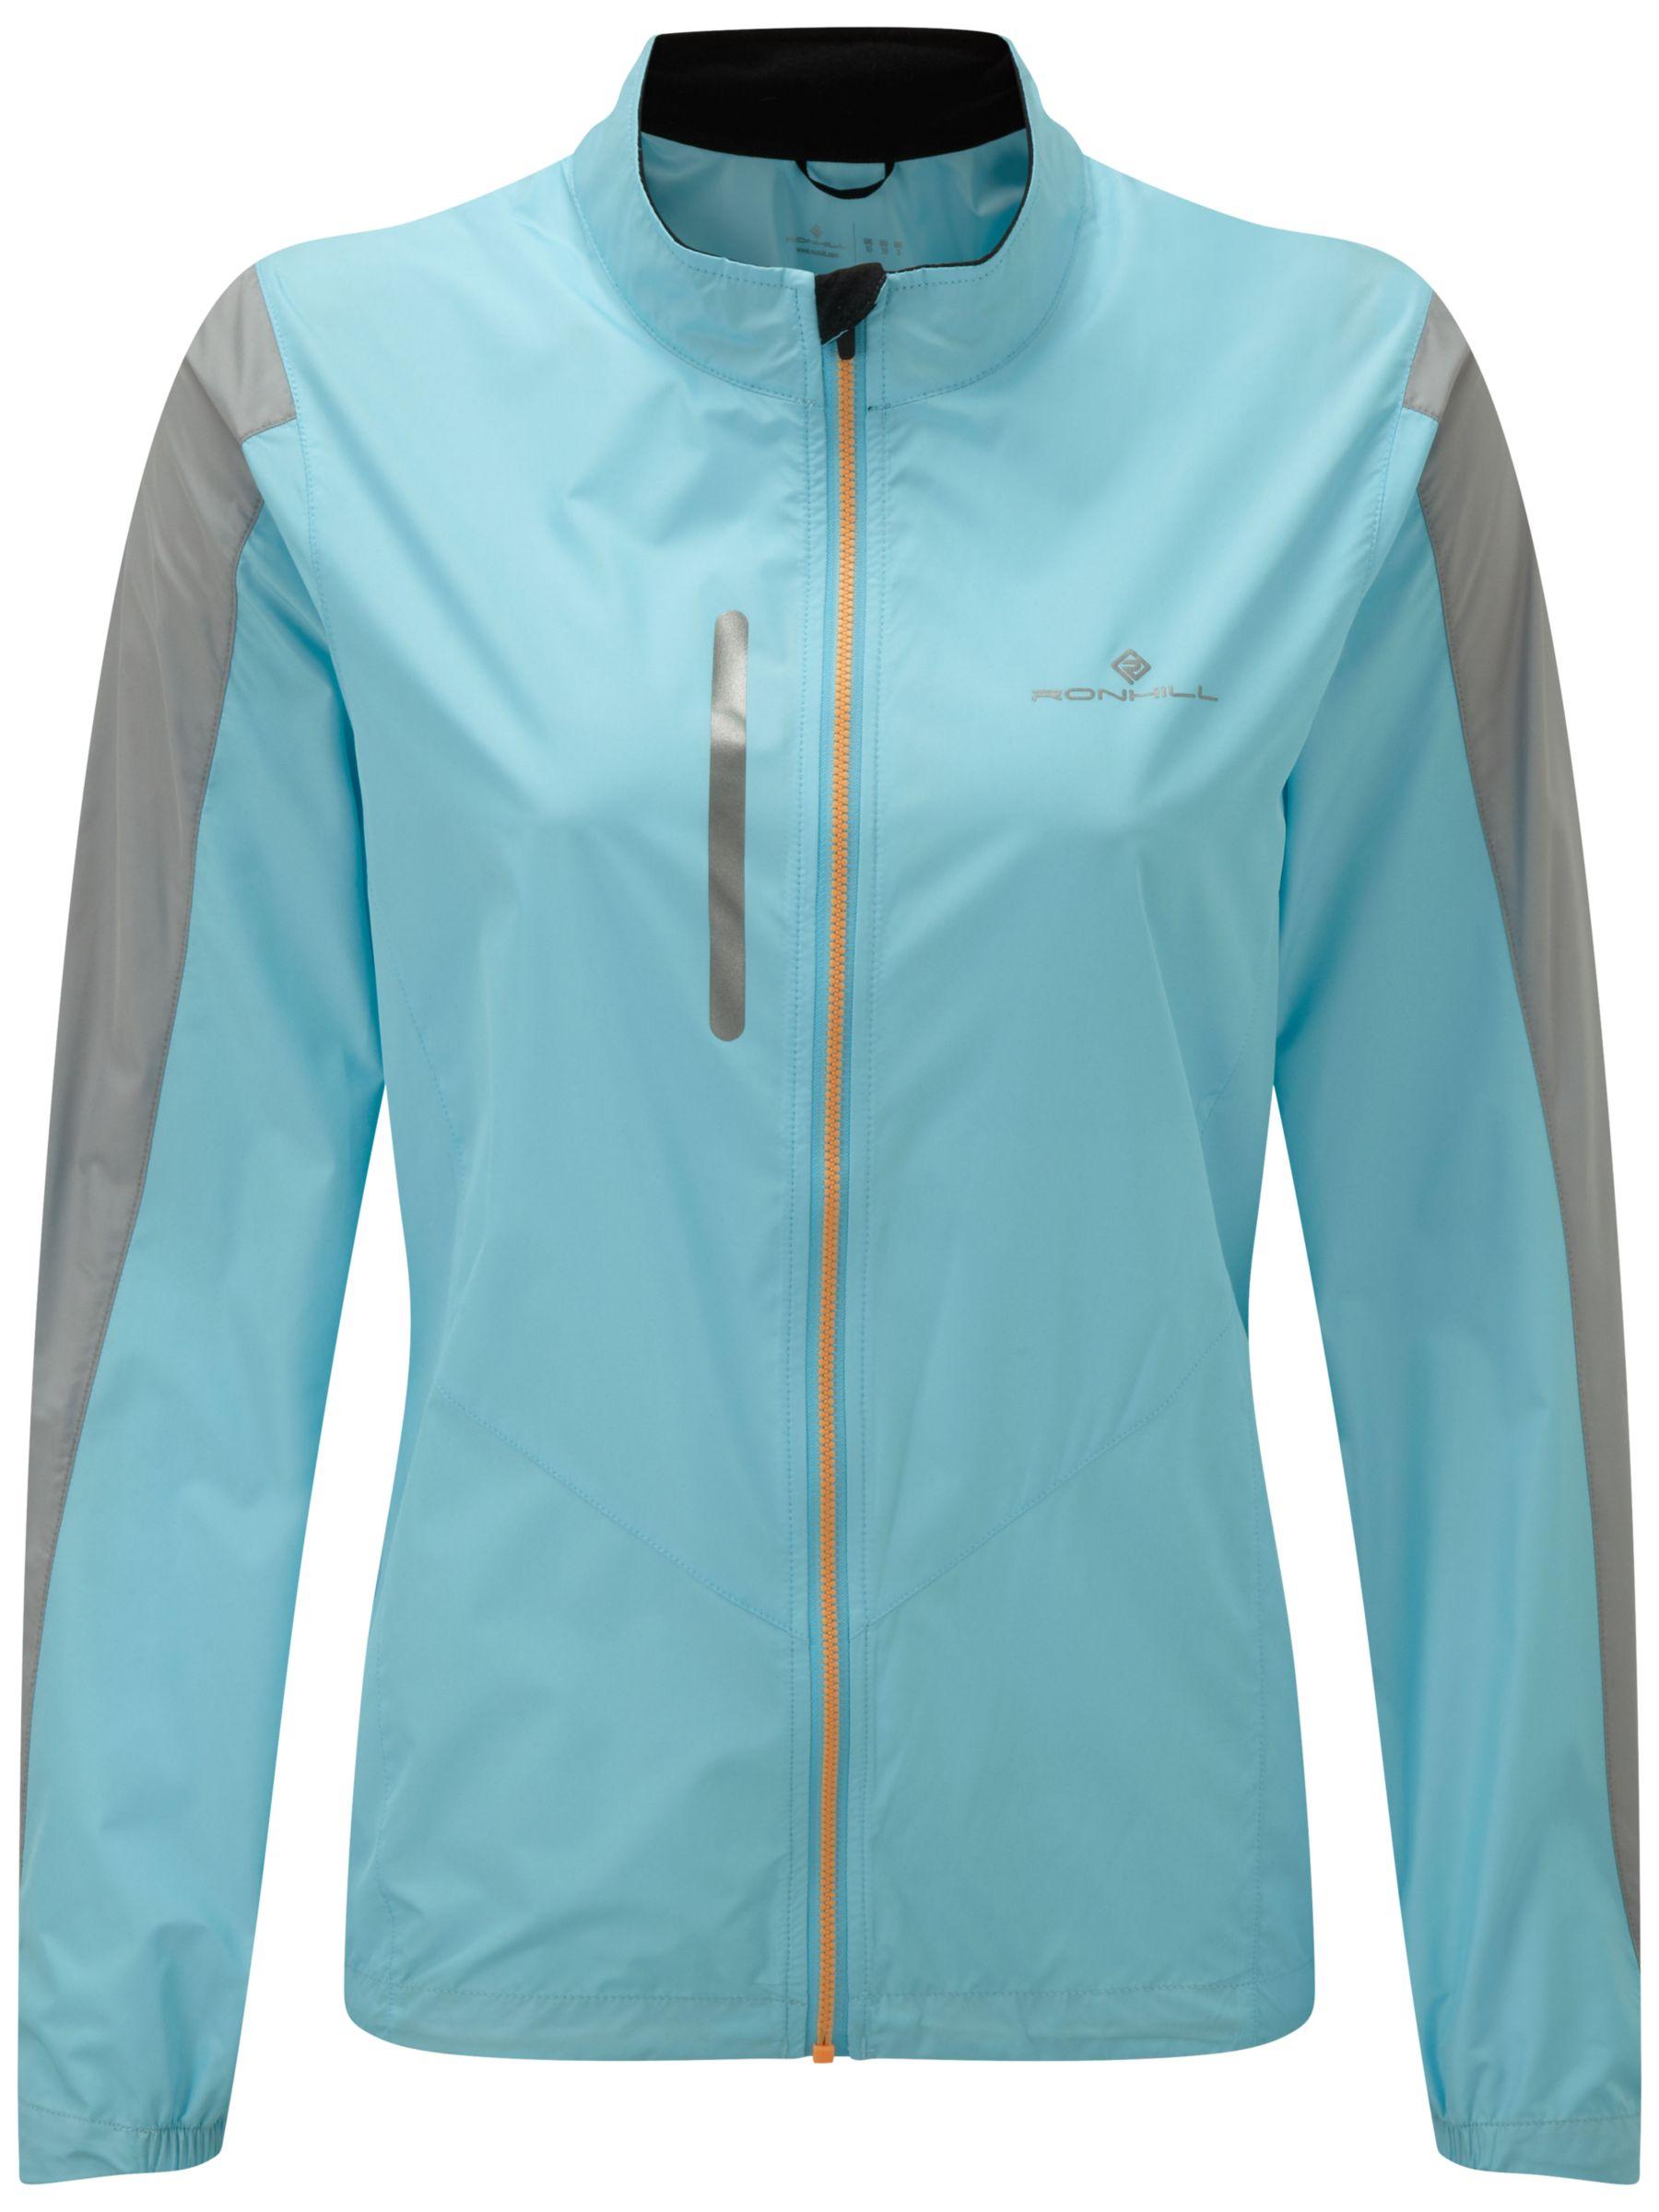 Ronhill Ronhill Stride Windspeed Women's Running Jacket, Blue/Grey